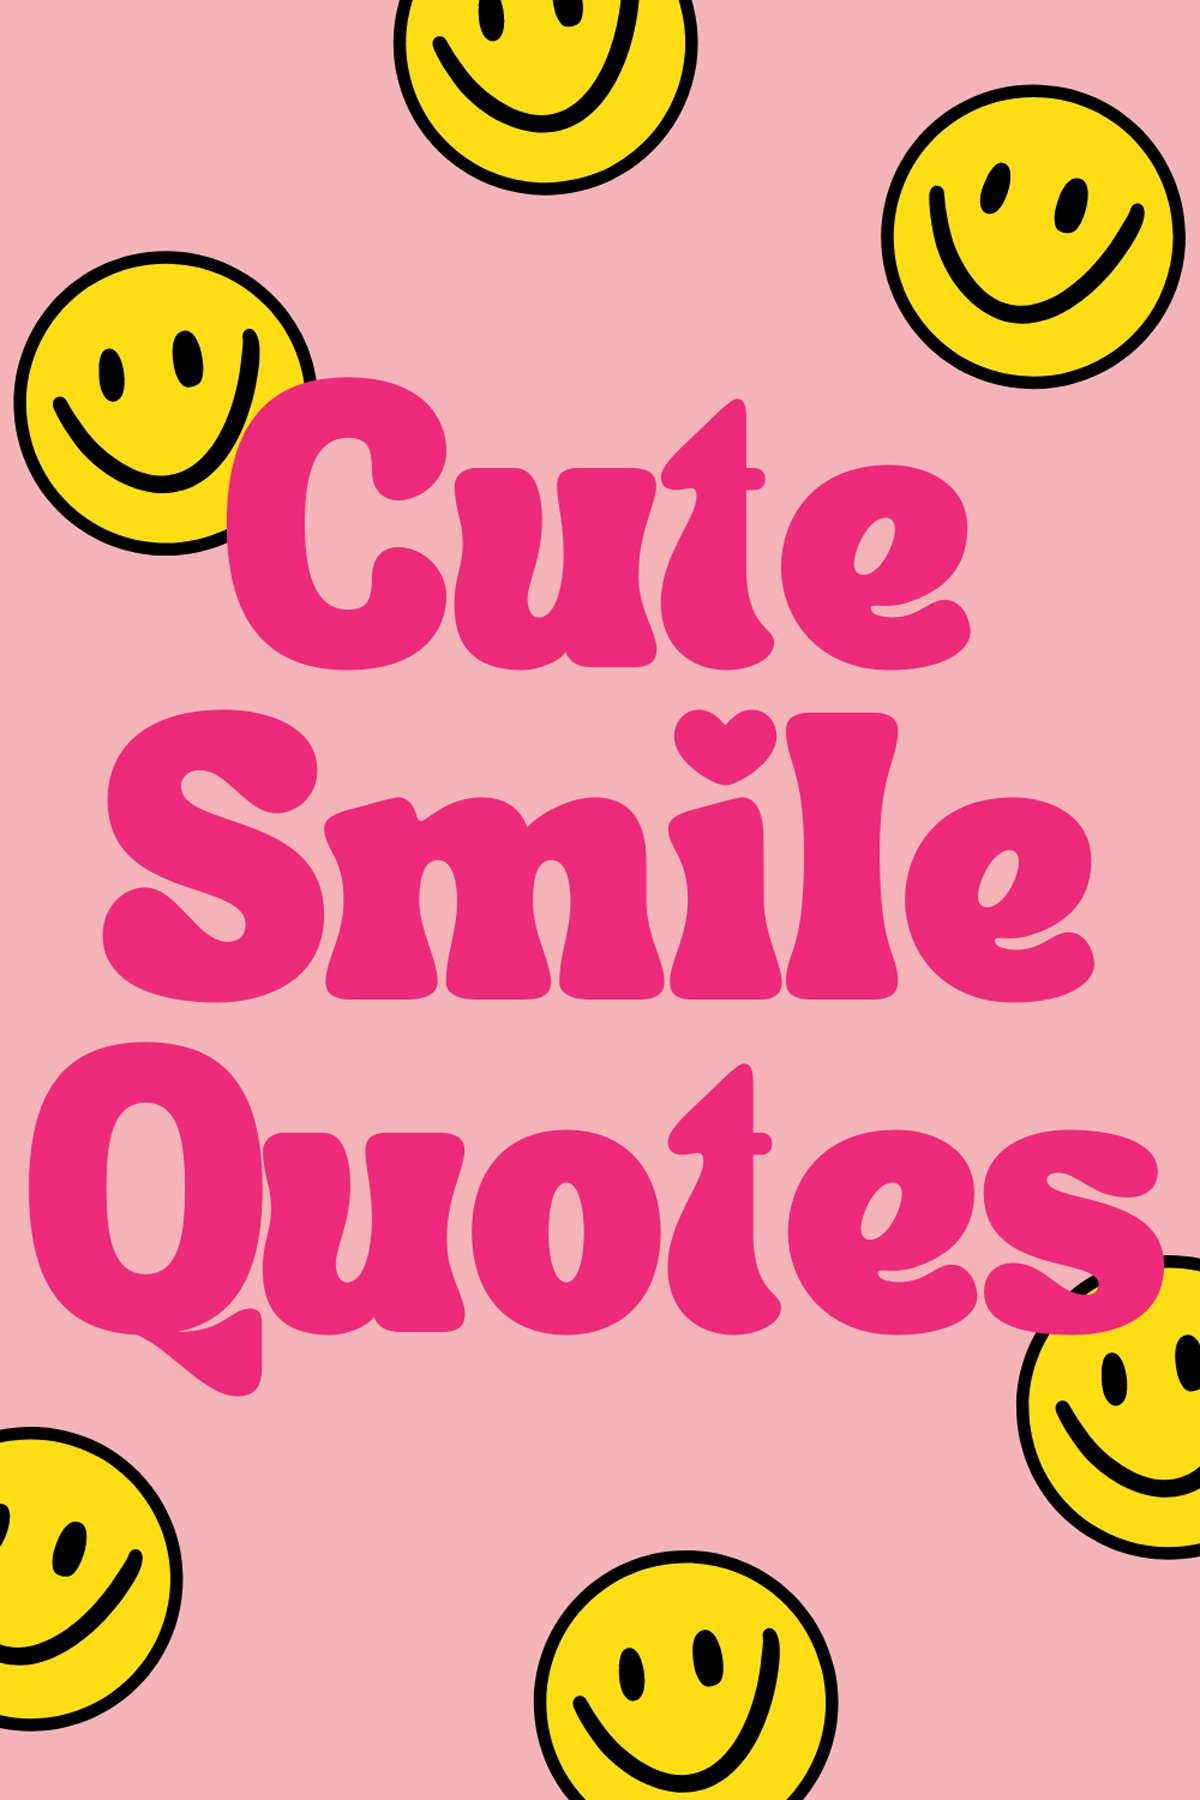 Smile Short Quotes